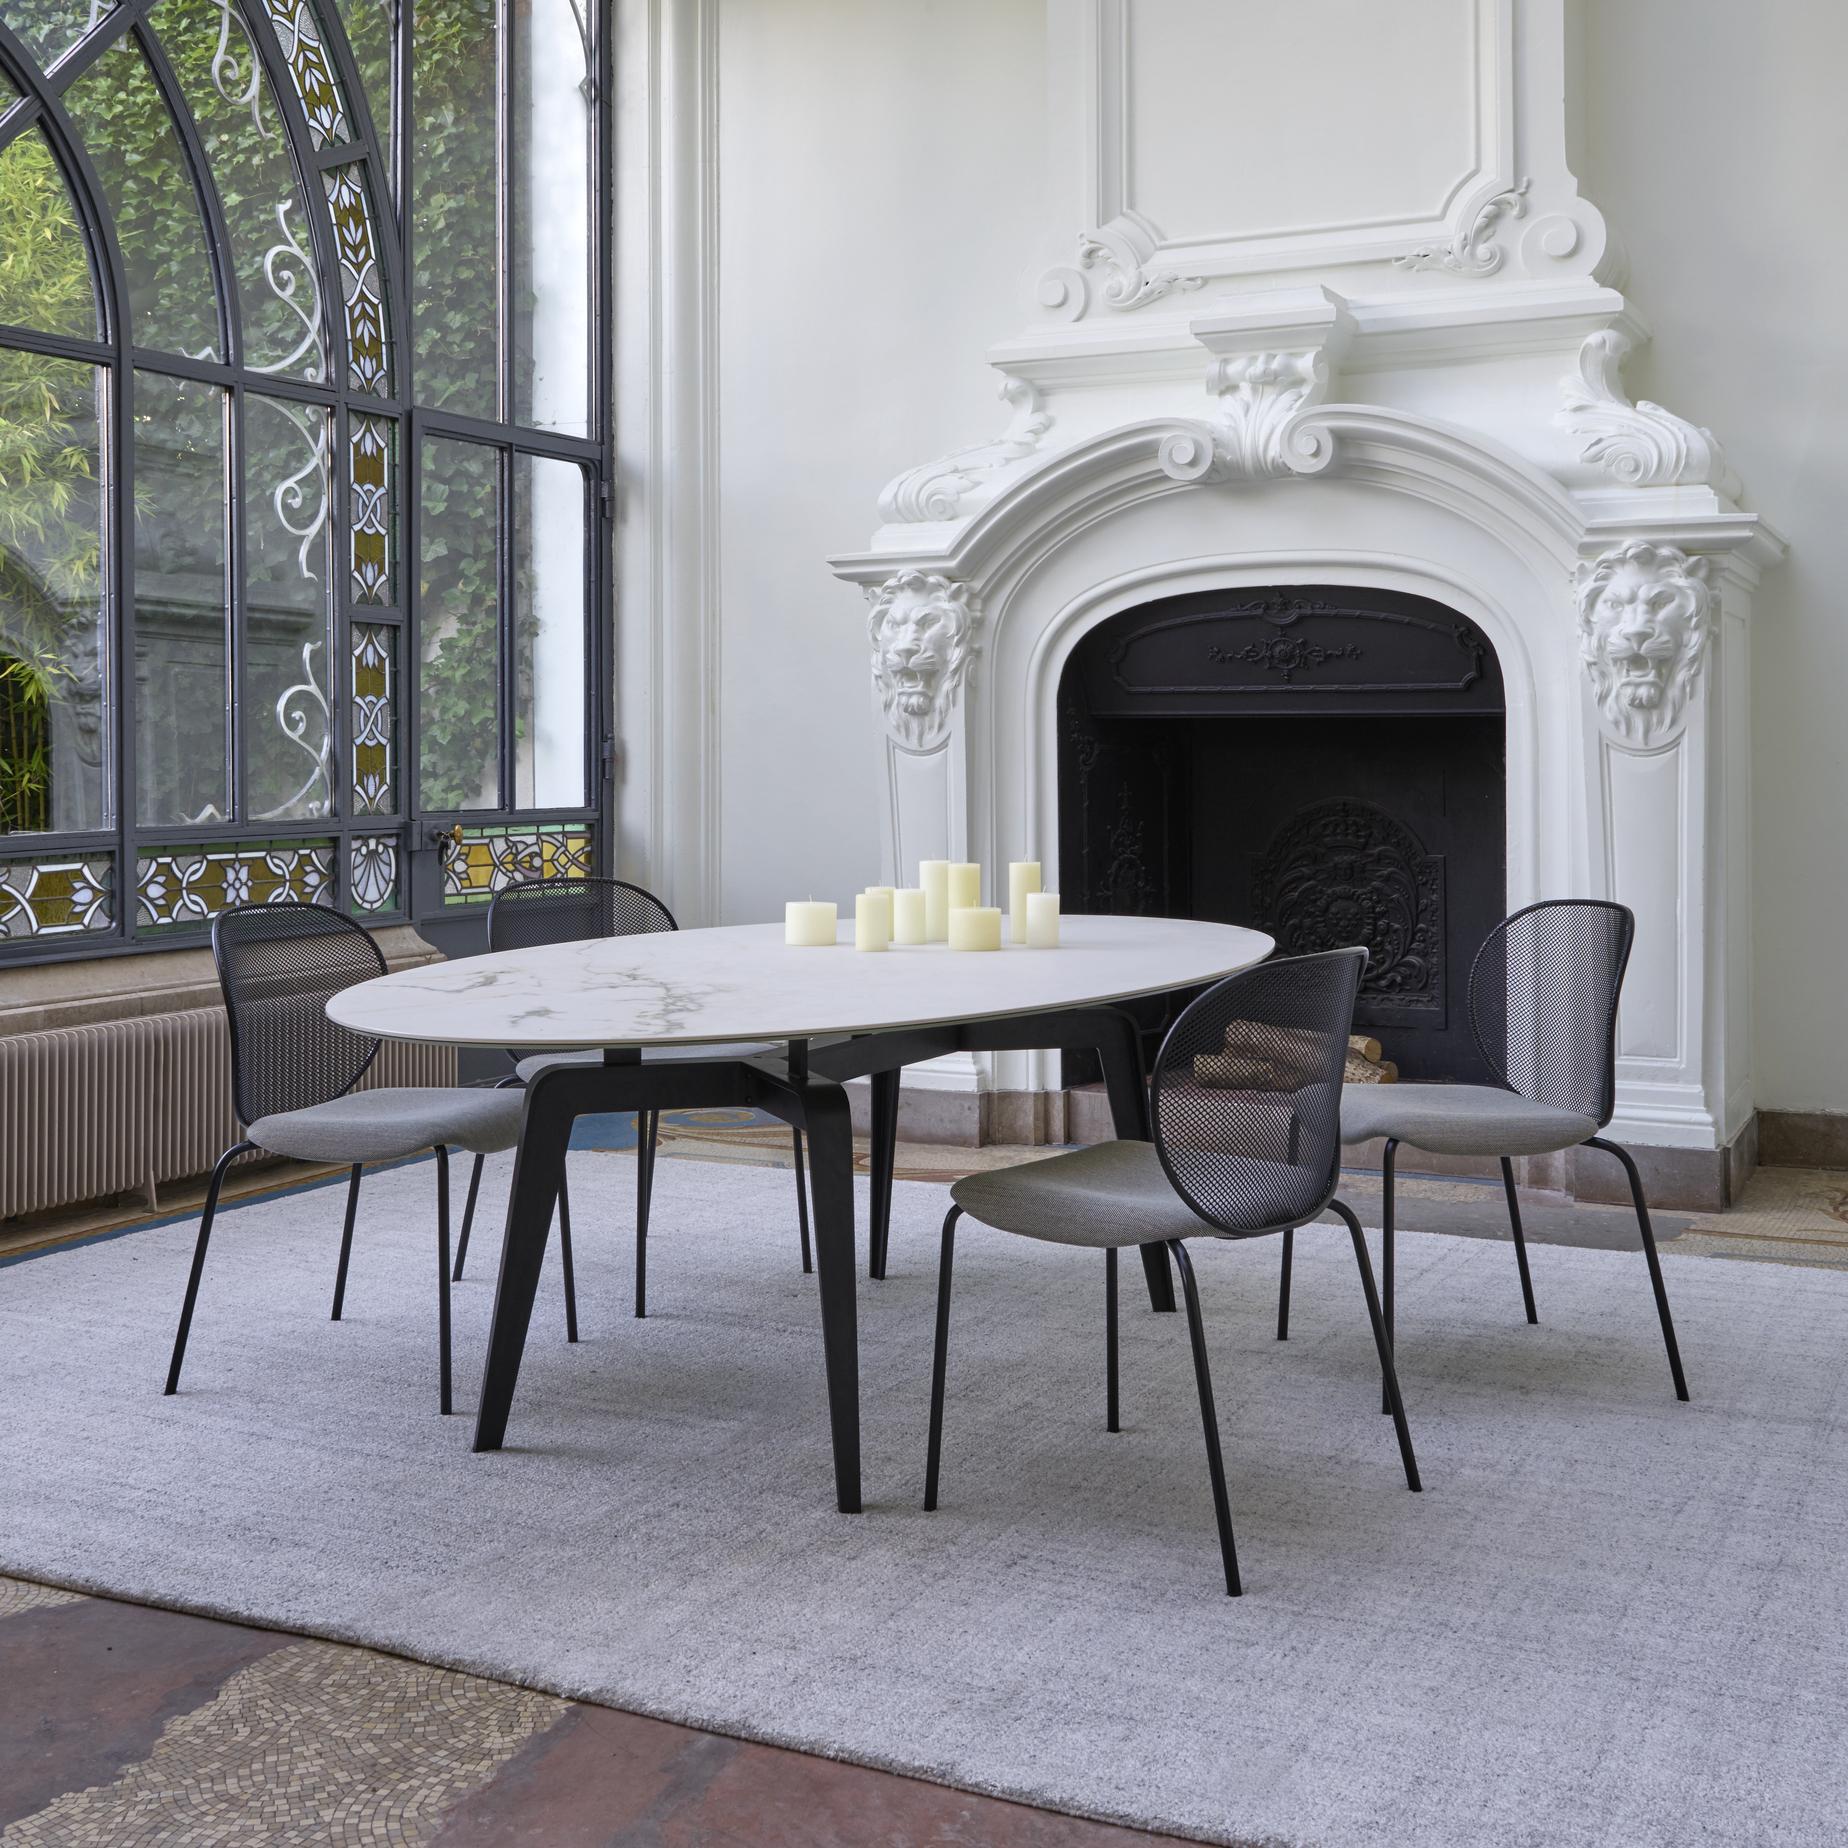 Odessa Tables From Designer Mauro Lipparini Ligne Roset Official Site